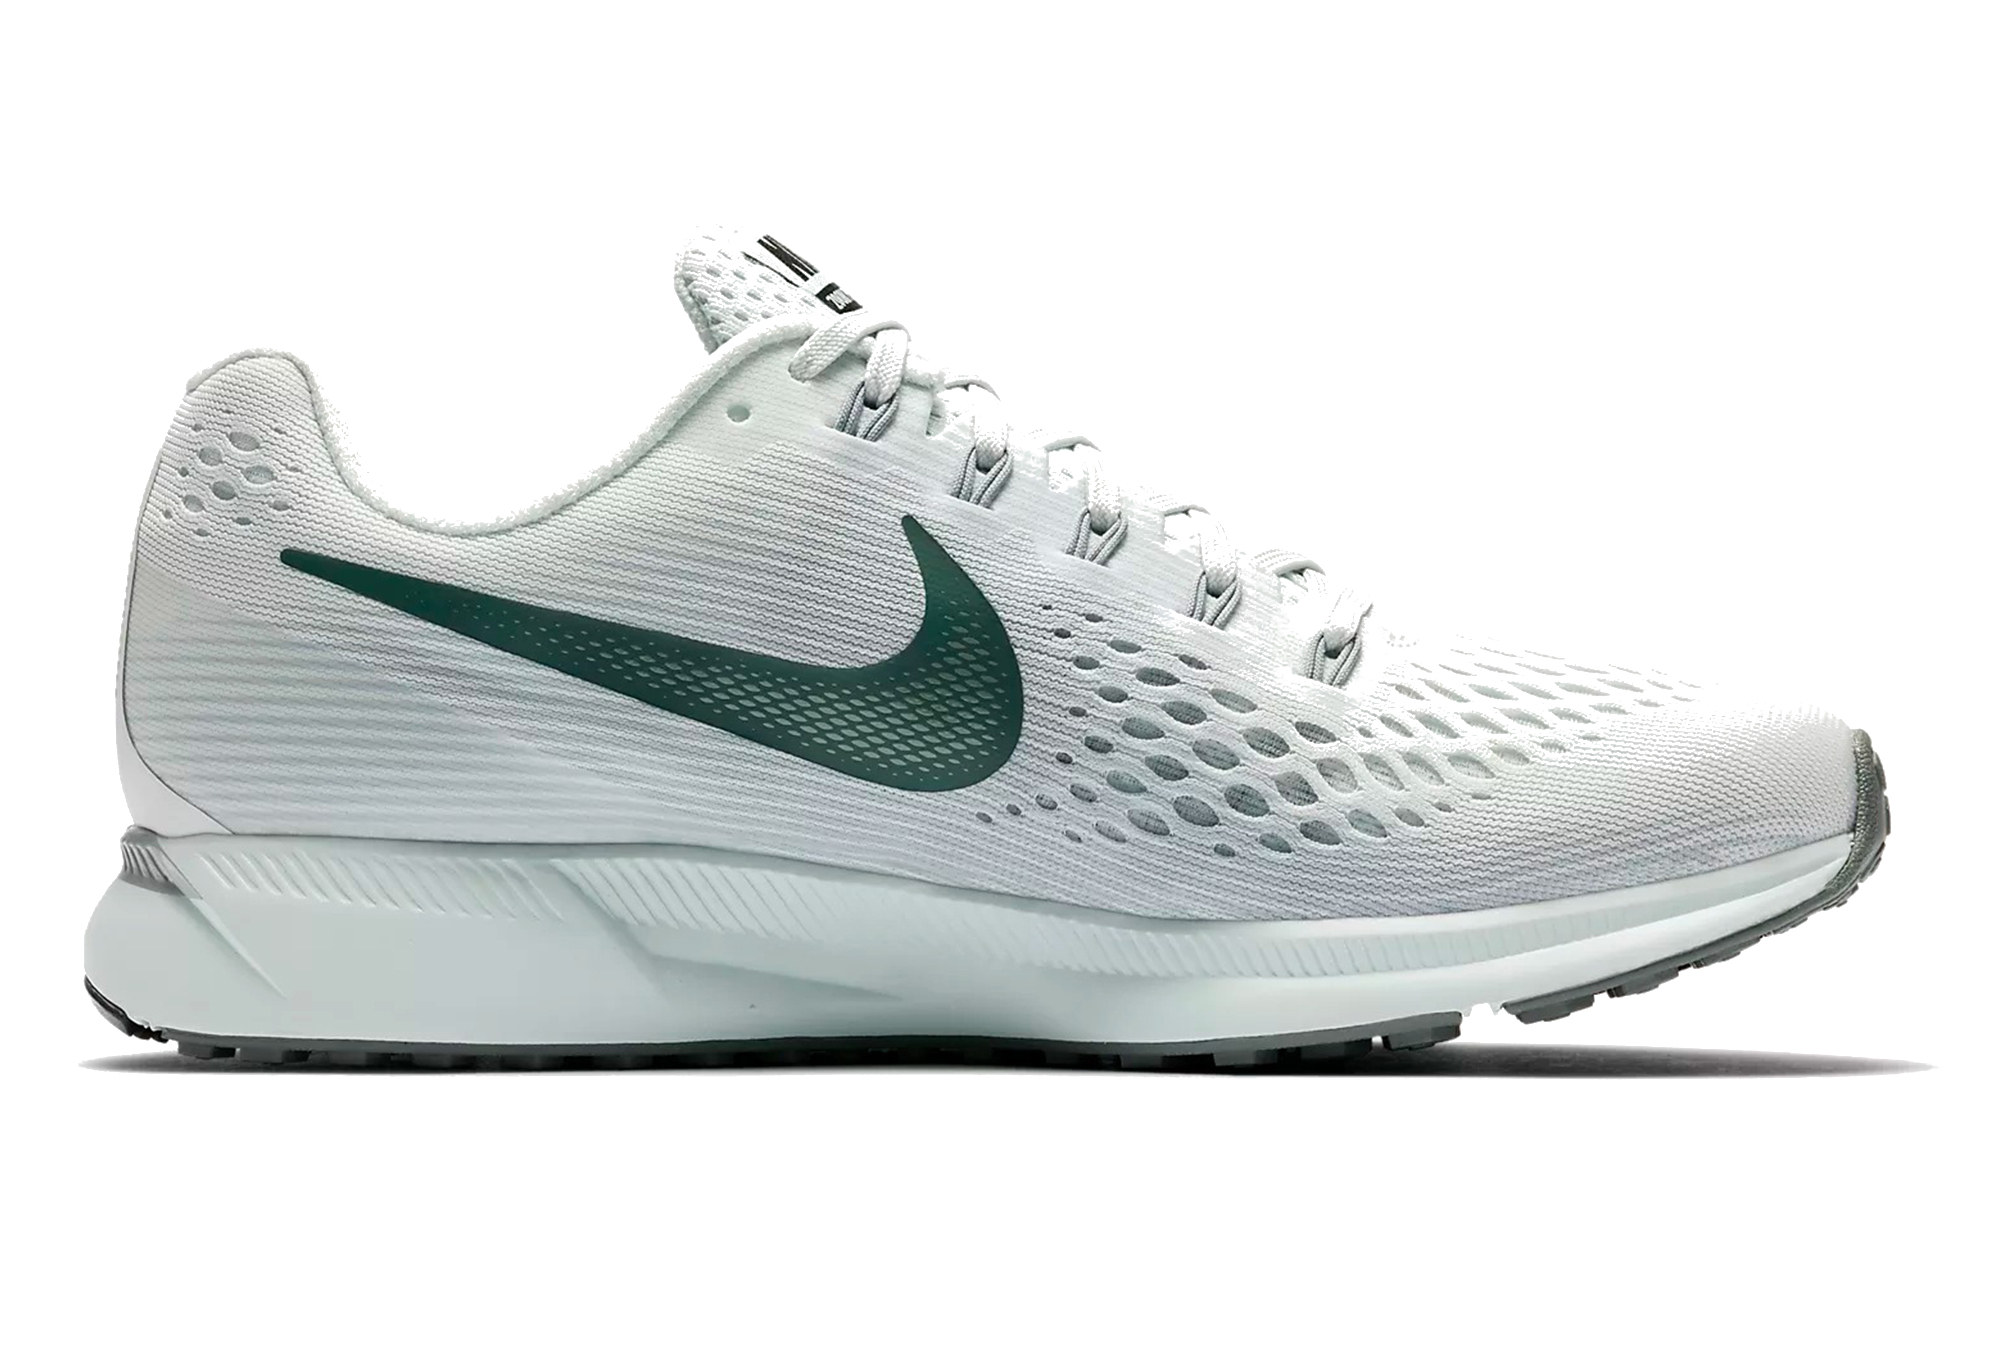 best loved ae3e5 3f925 Chaussures de Running Femme Nike Air Zoom Pegasus 34 Blanc   Vert